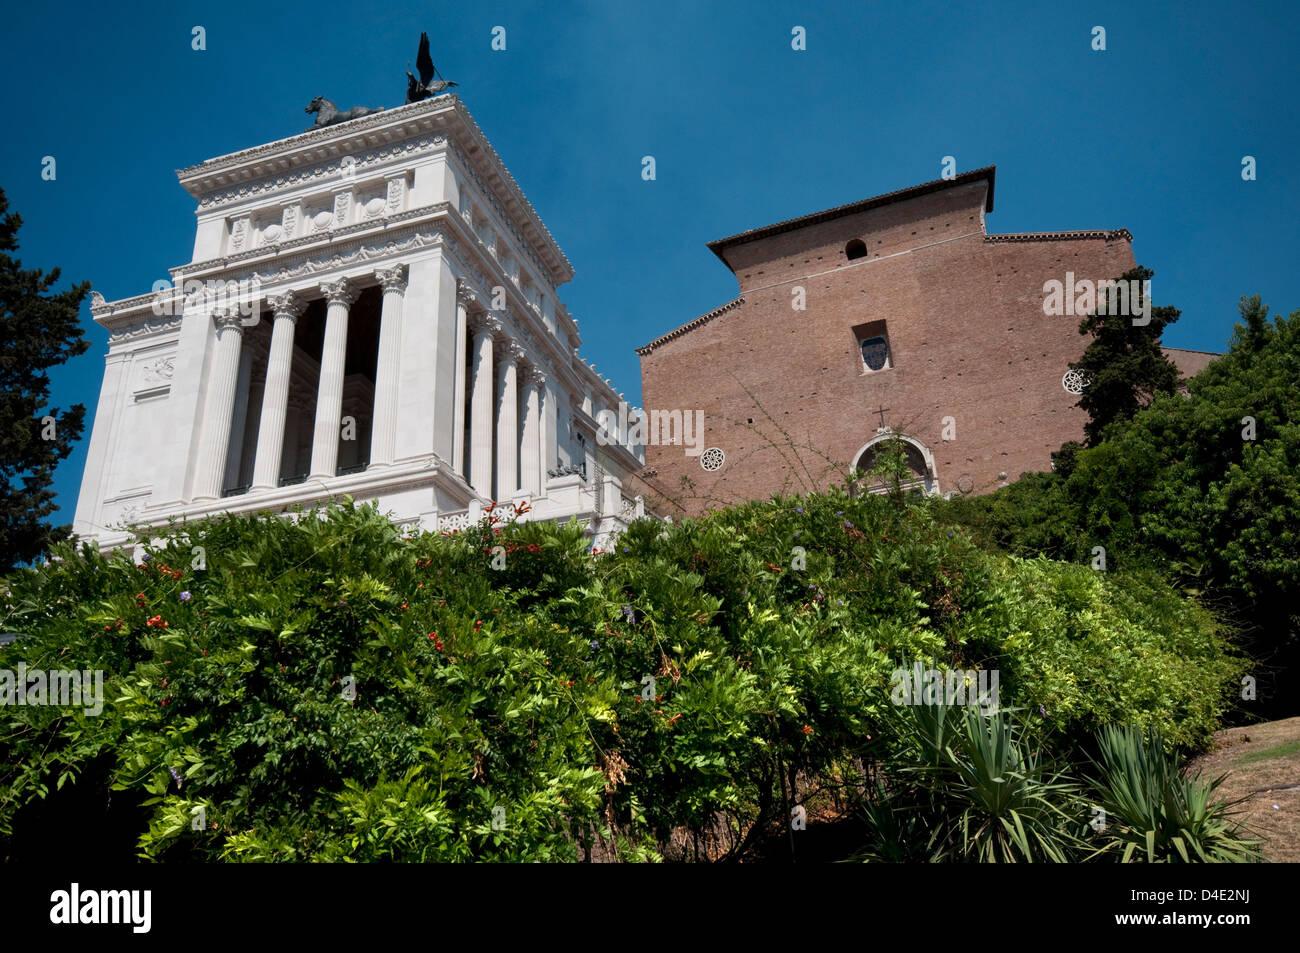 L'Italie, Lazio, Rome, église de Santa Maria in Aracoeli et le Vittoriano Photo Stock